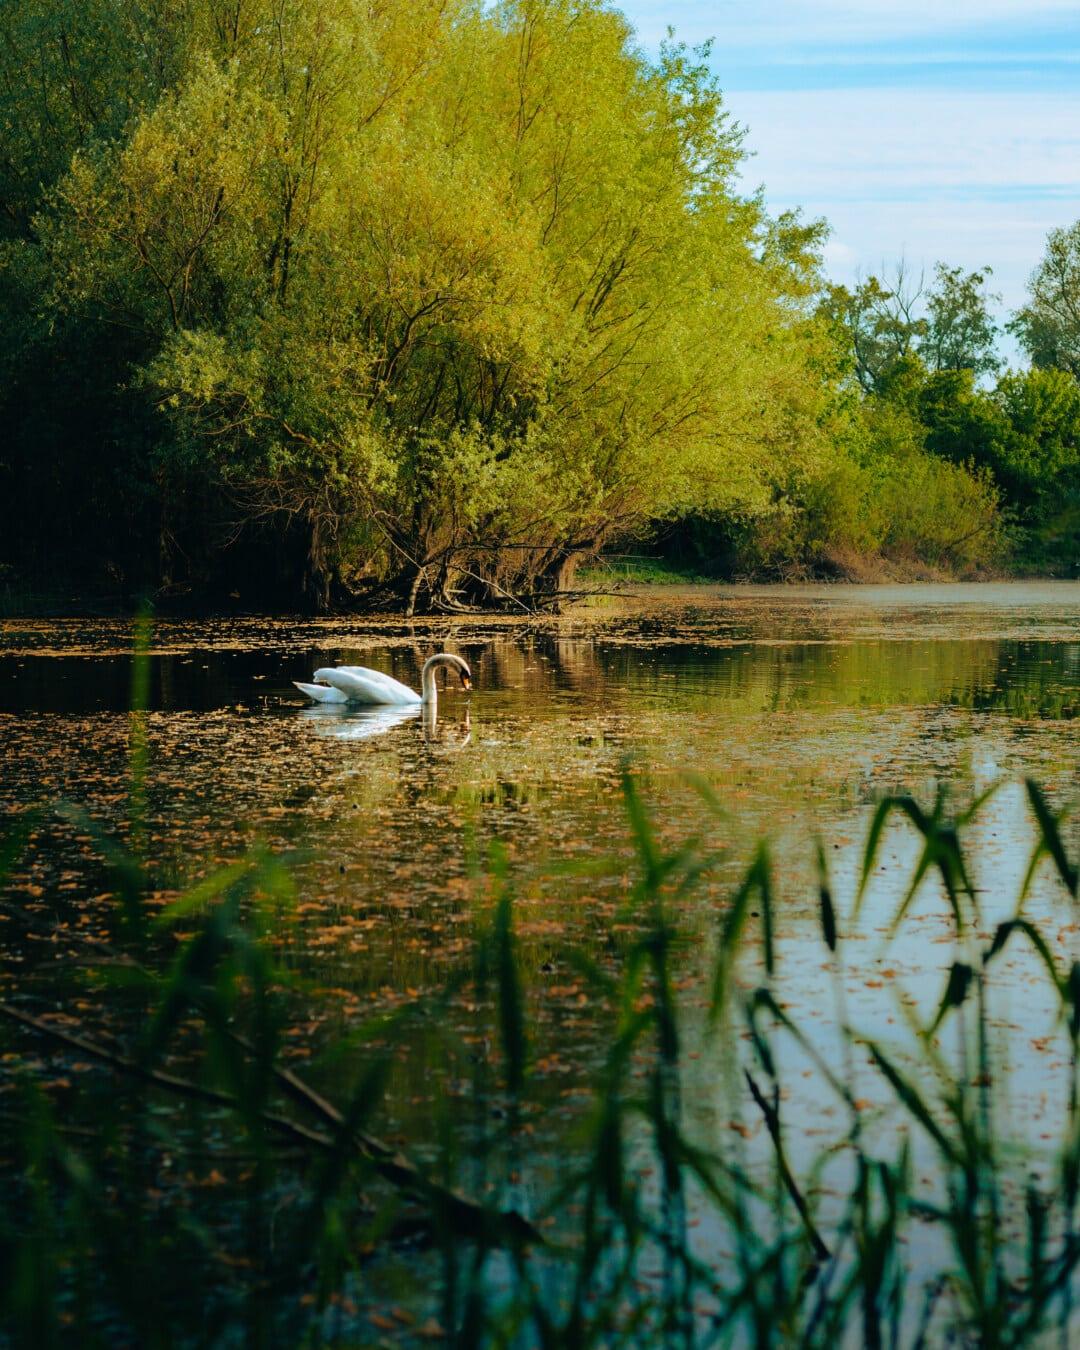 akvatisk fugl, marsken, økosystem, vandplanter, nåde, svane, svømning, smuk, fugl, natur